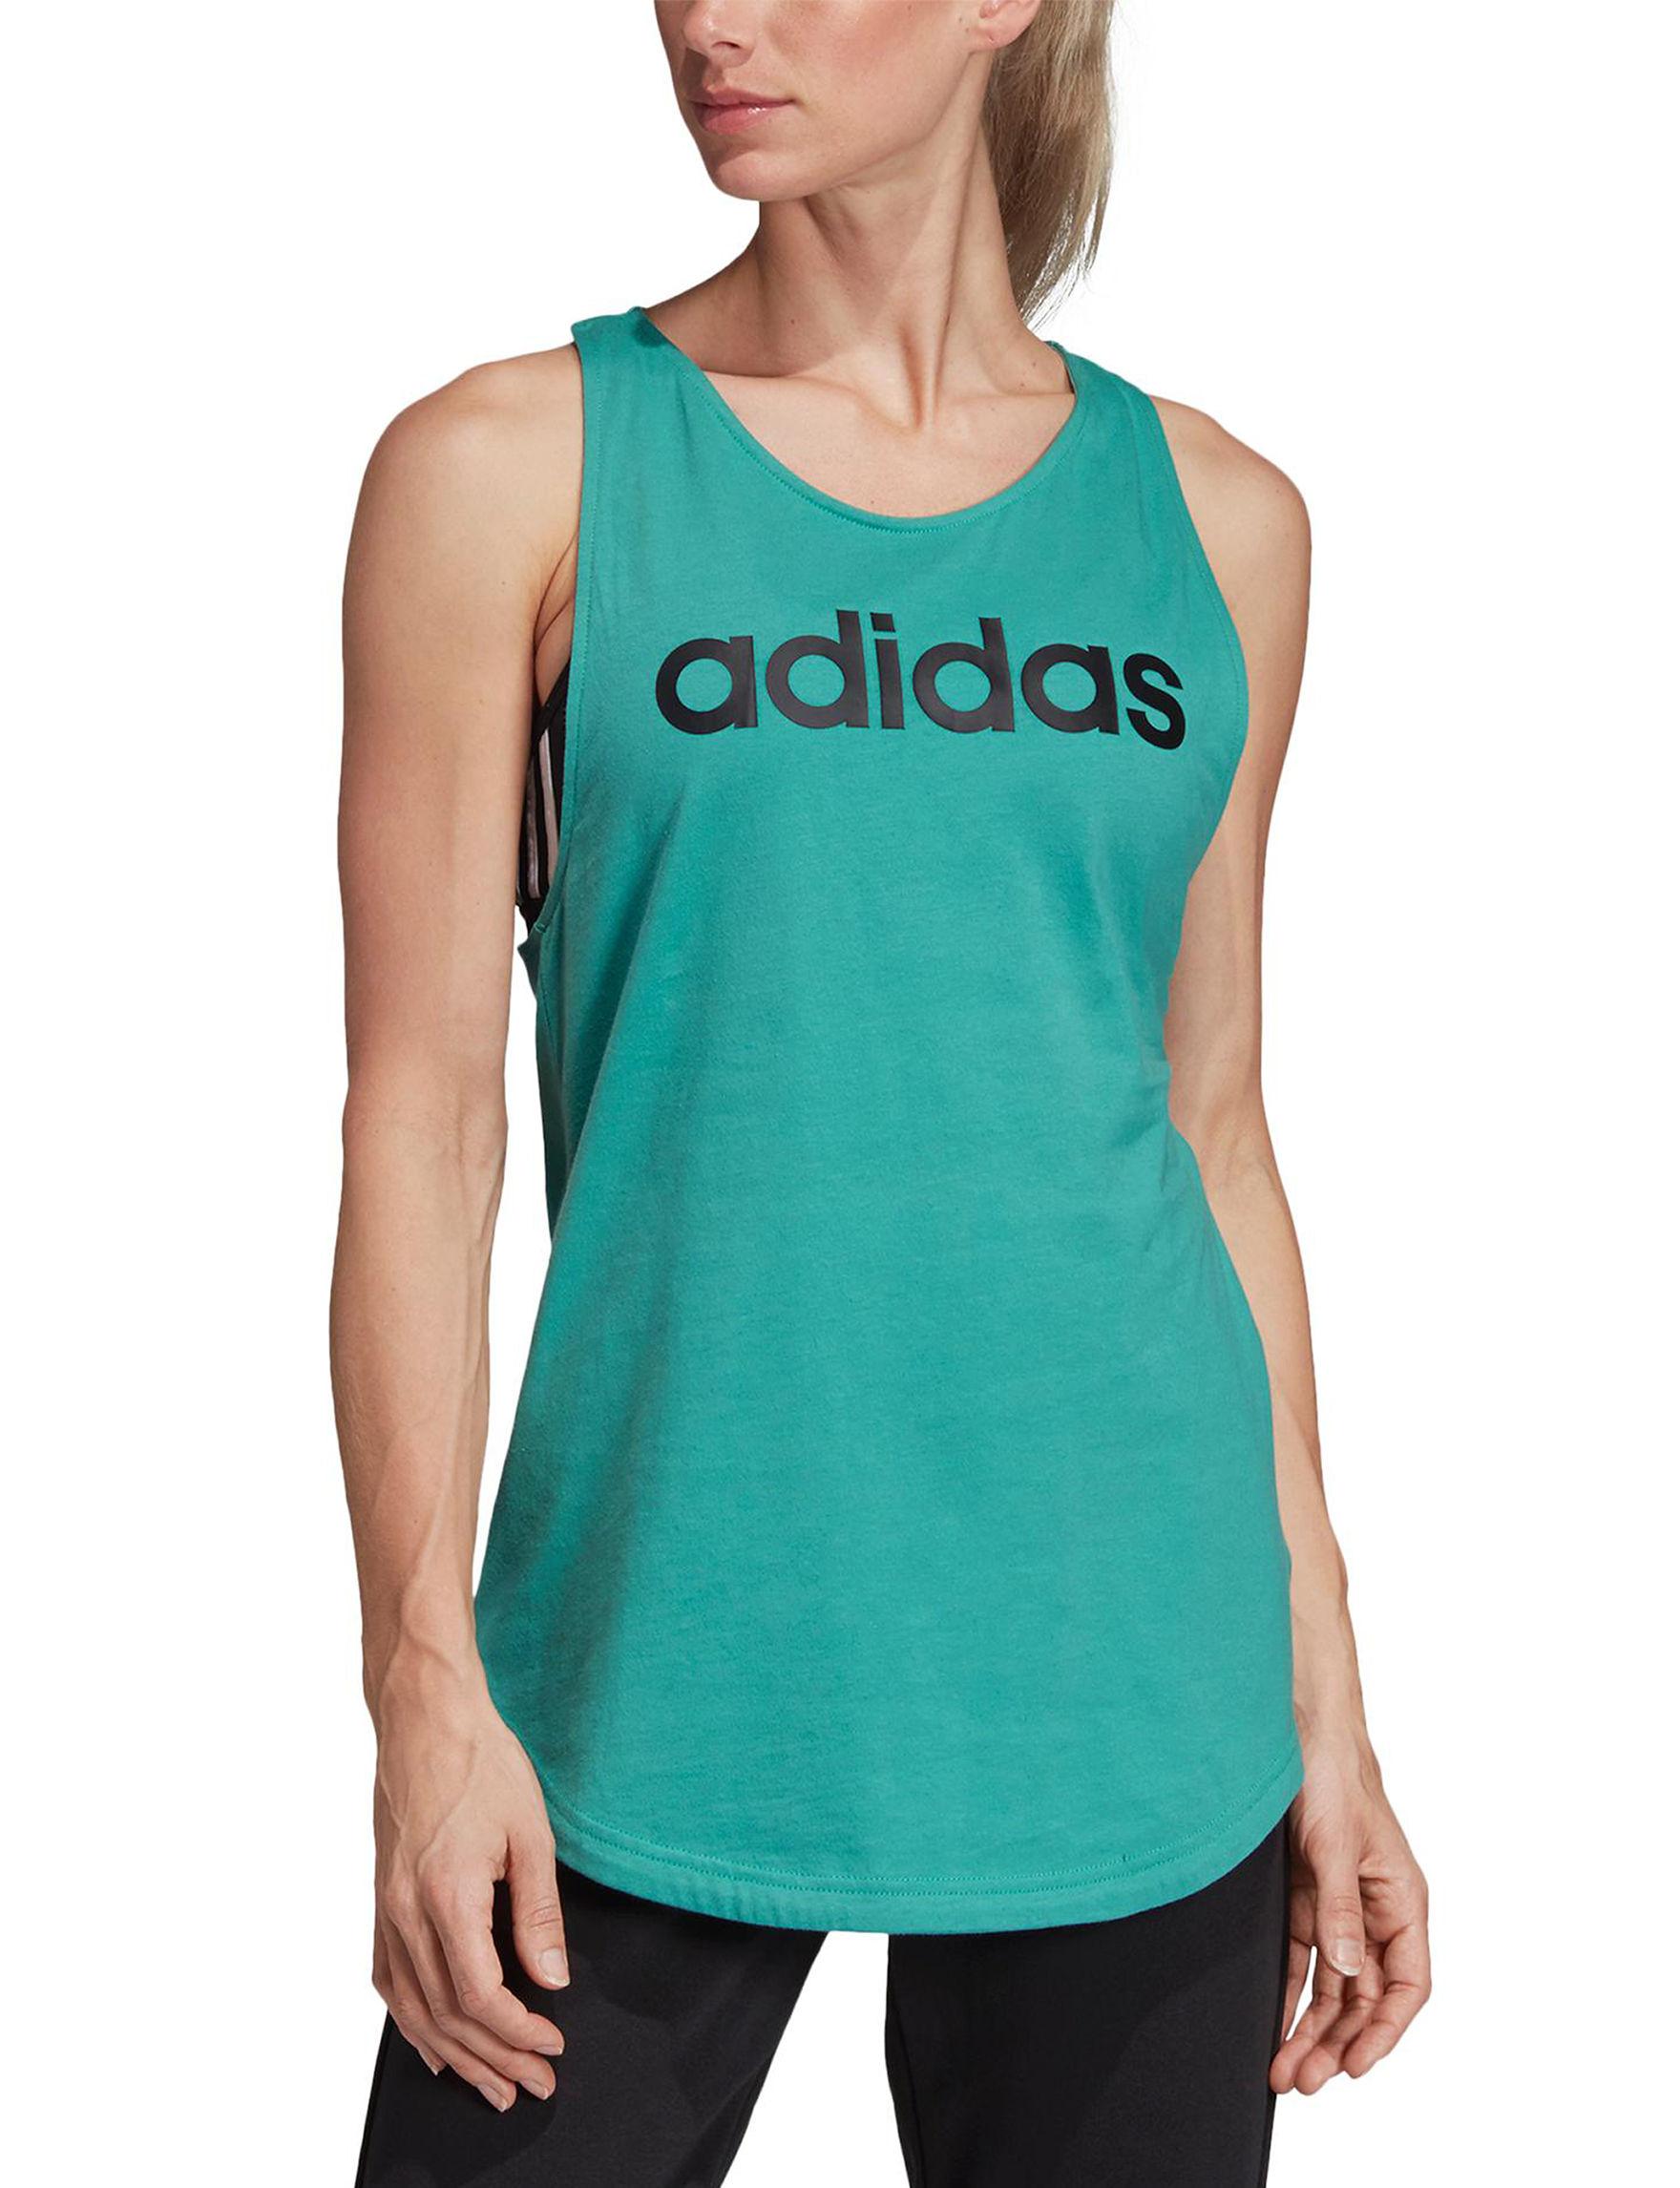 Adidas Aqua / Black Tees & Tanks